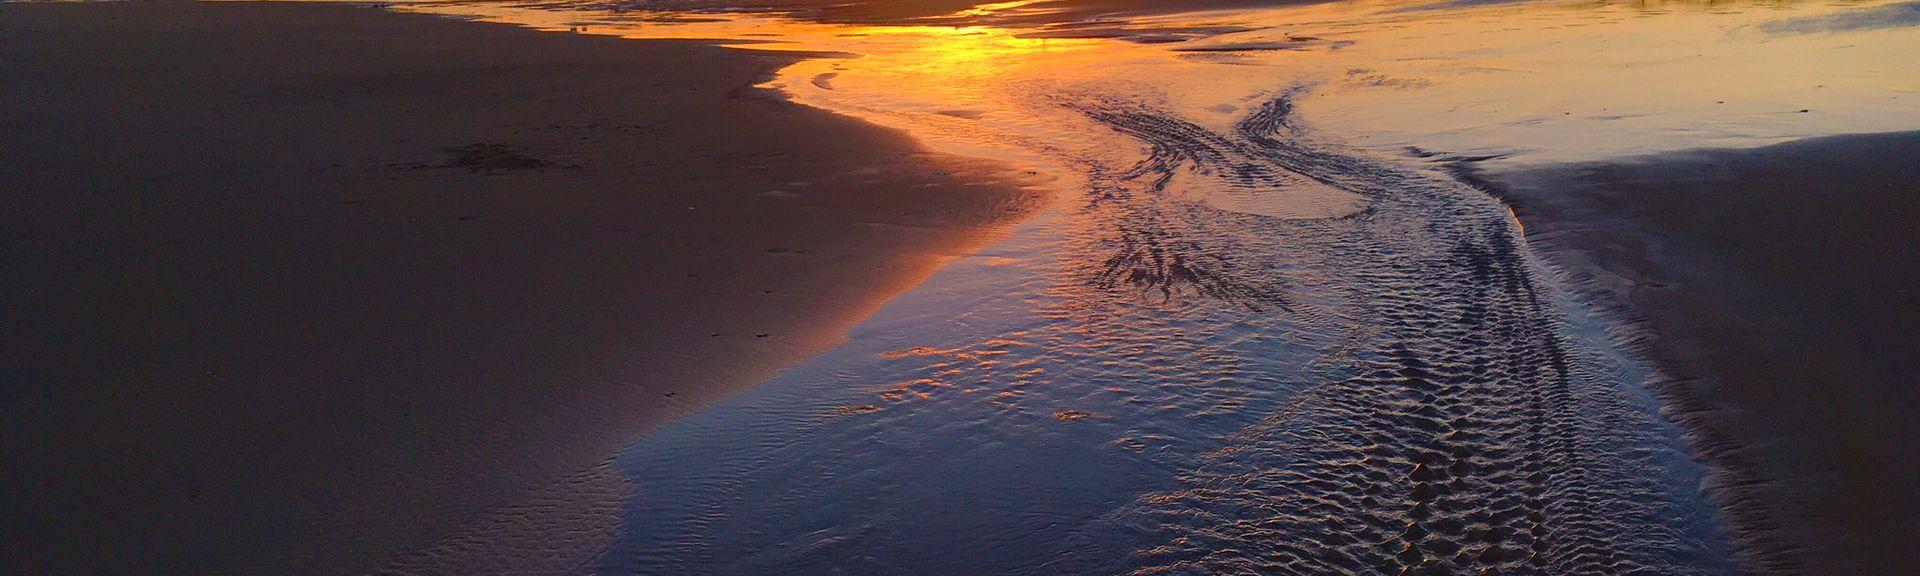 Cabanas Beach, Tavira, Portugal